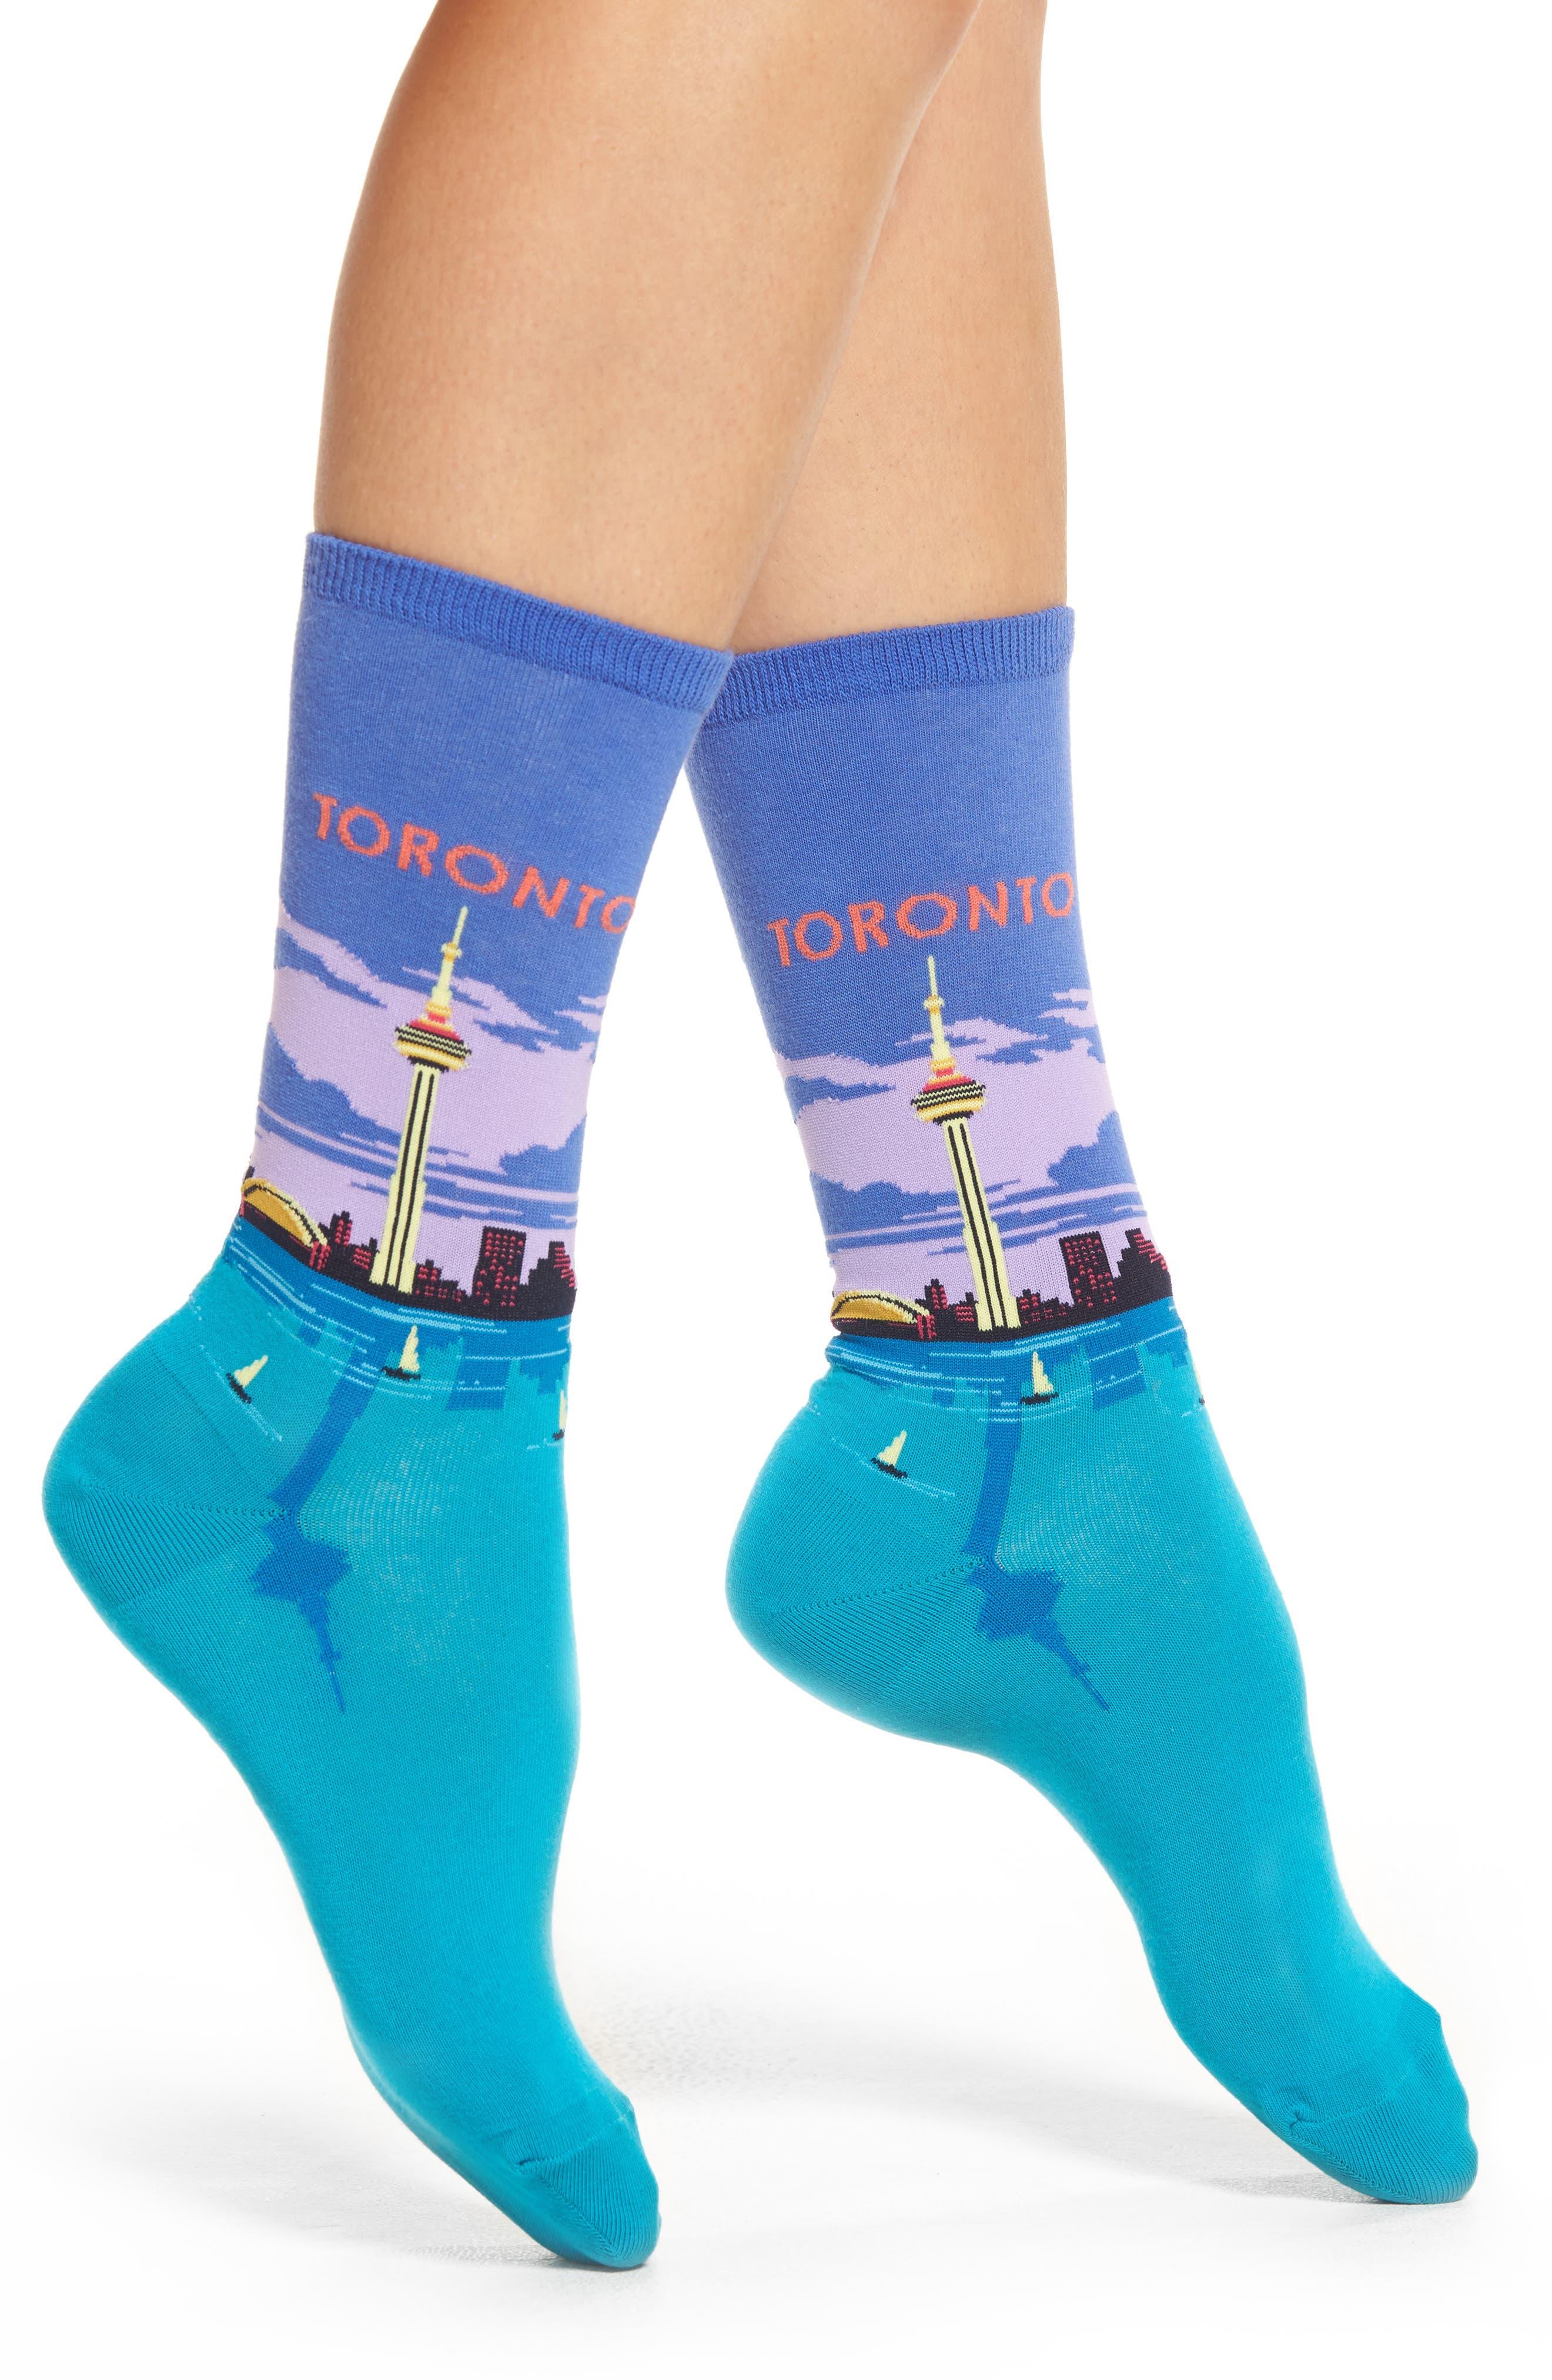 Toronto Crew Socks,                         Main,                         color, Blue